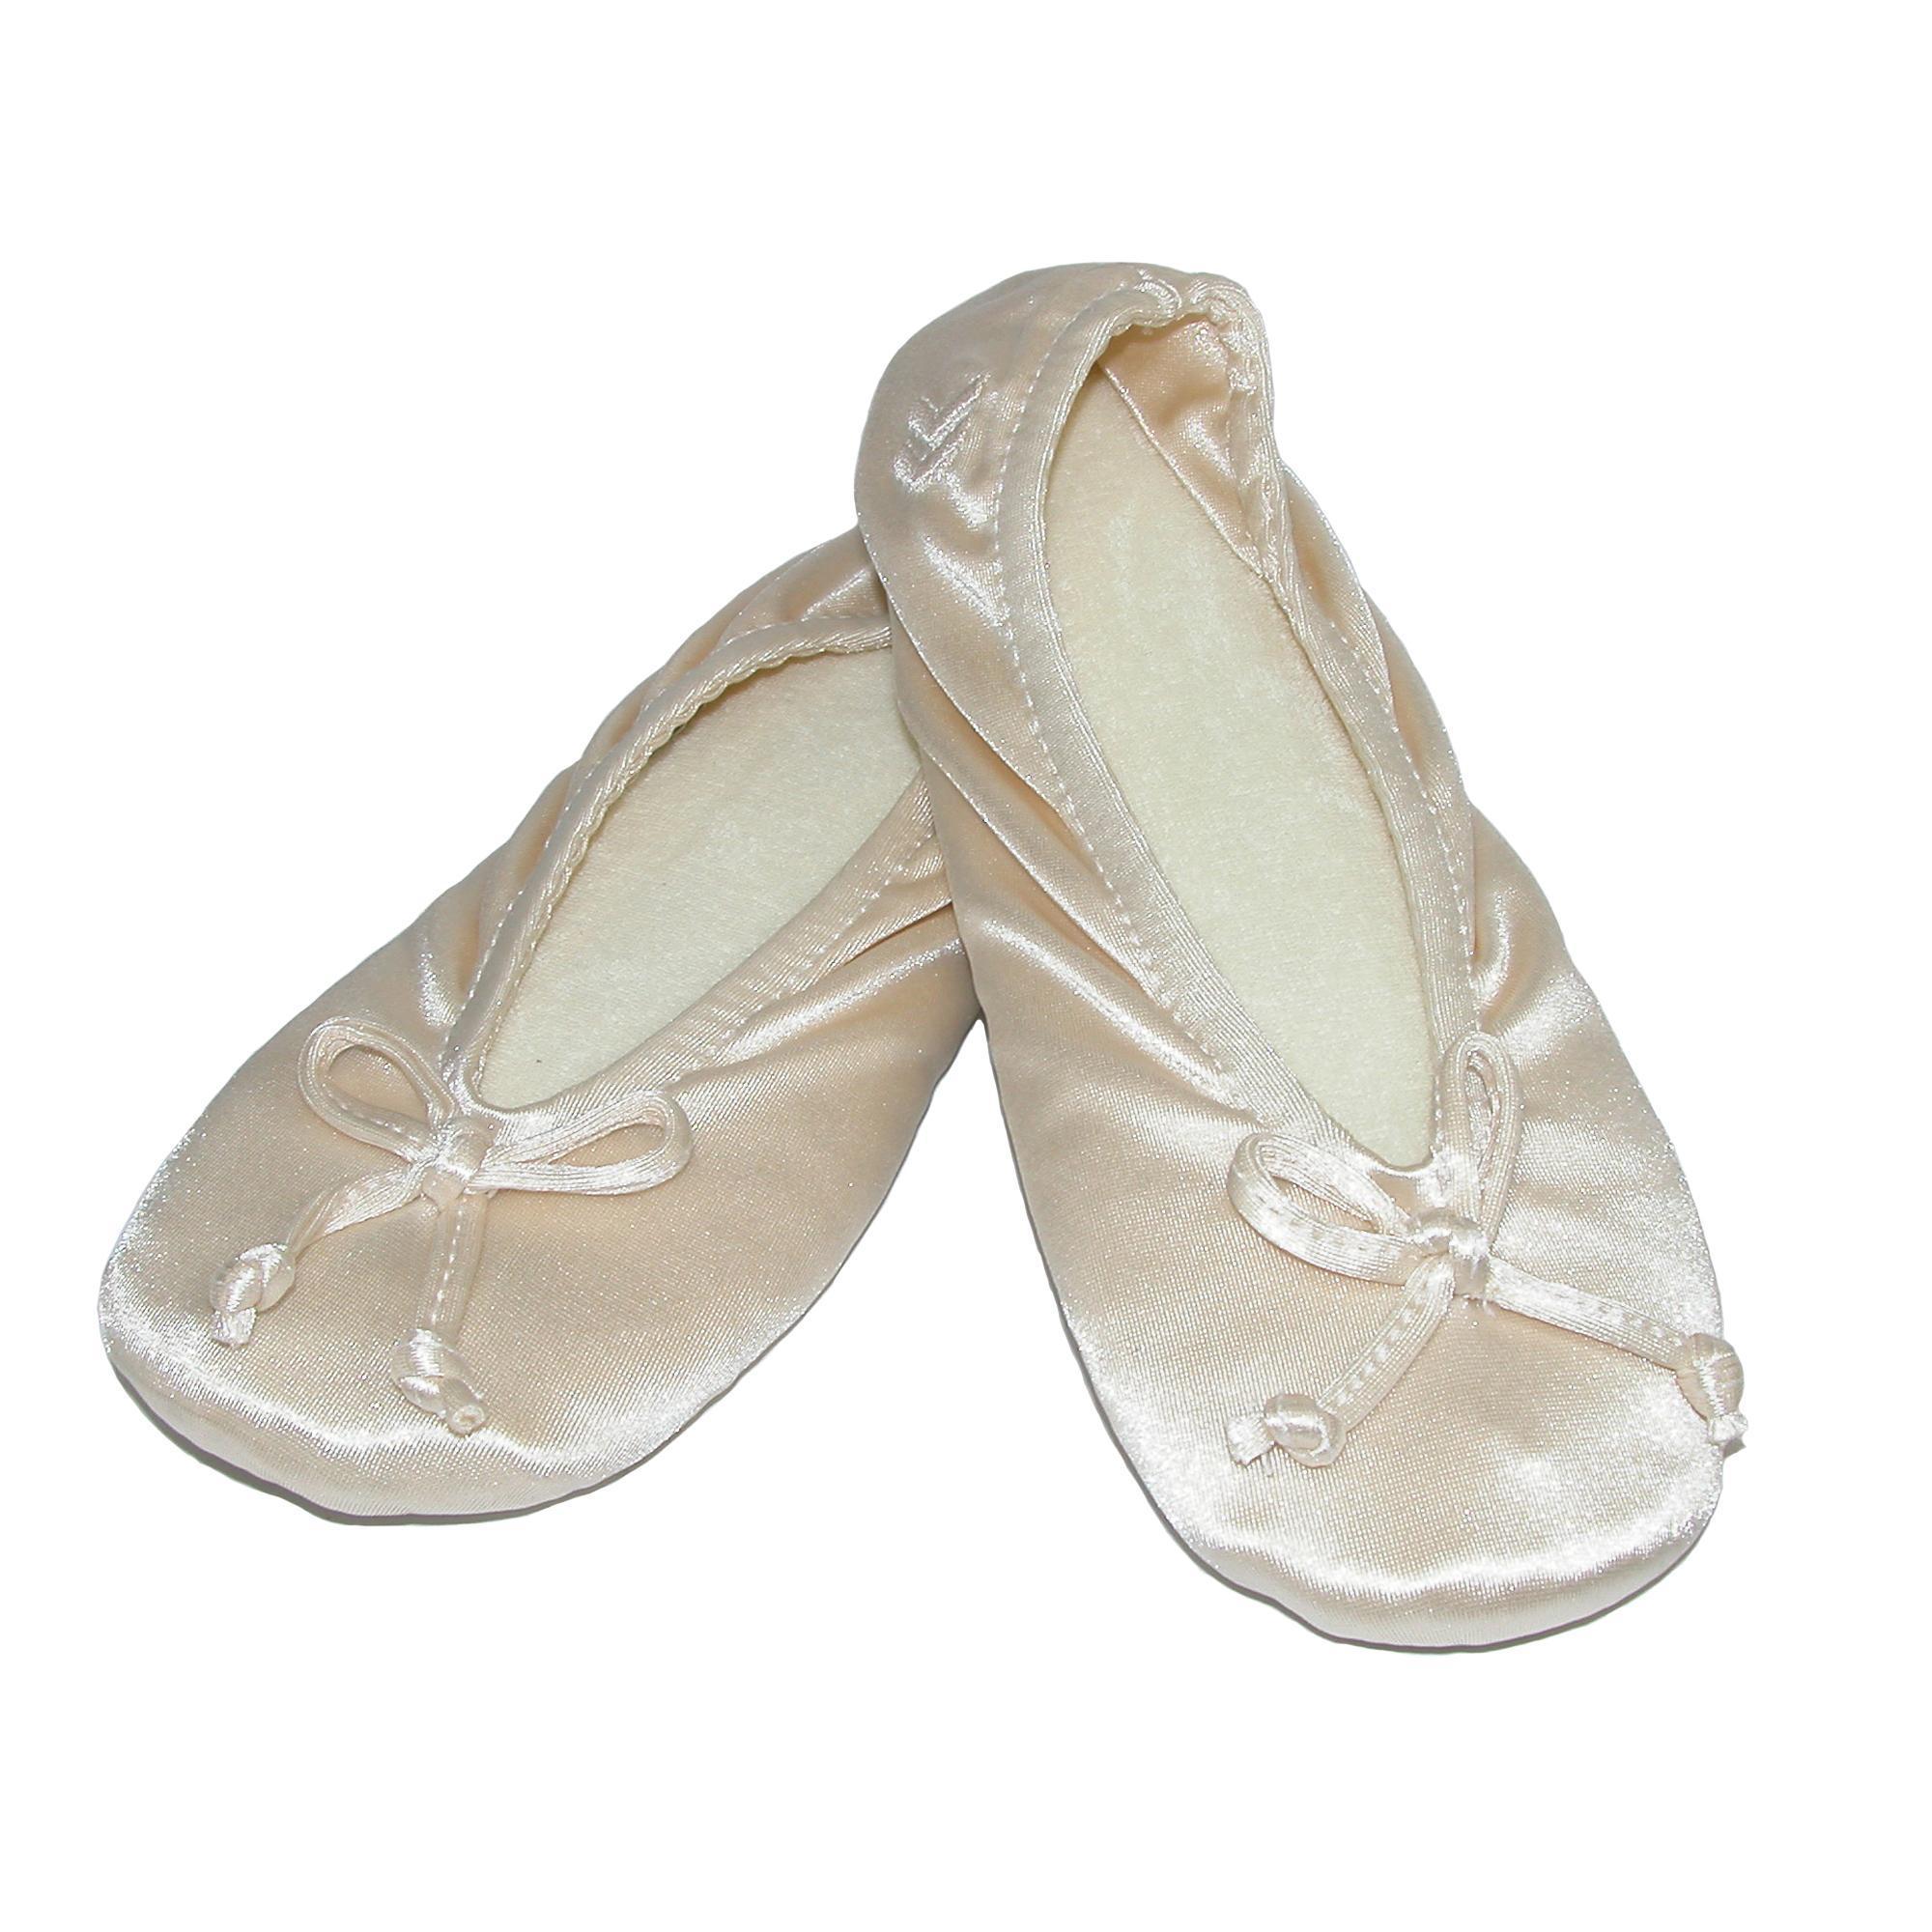 New-Isotoner-Women-039-s-Satin-Classic-Ballerina-Slippers thumbnail 12